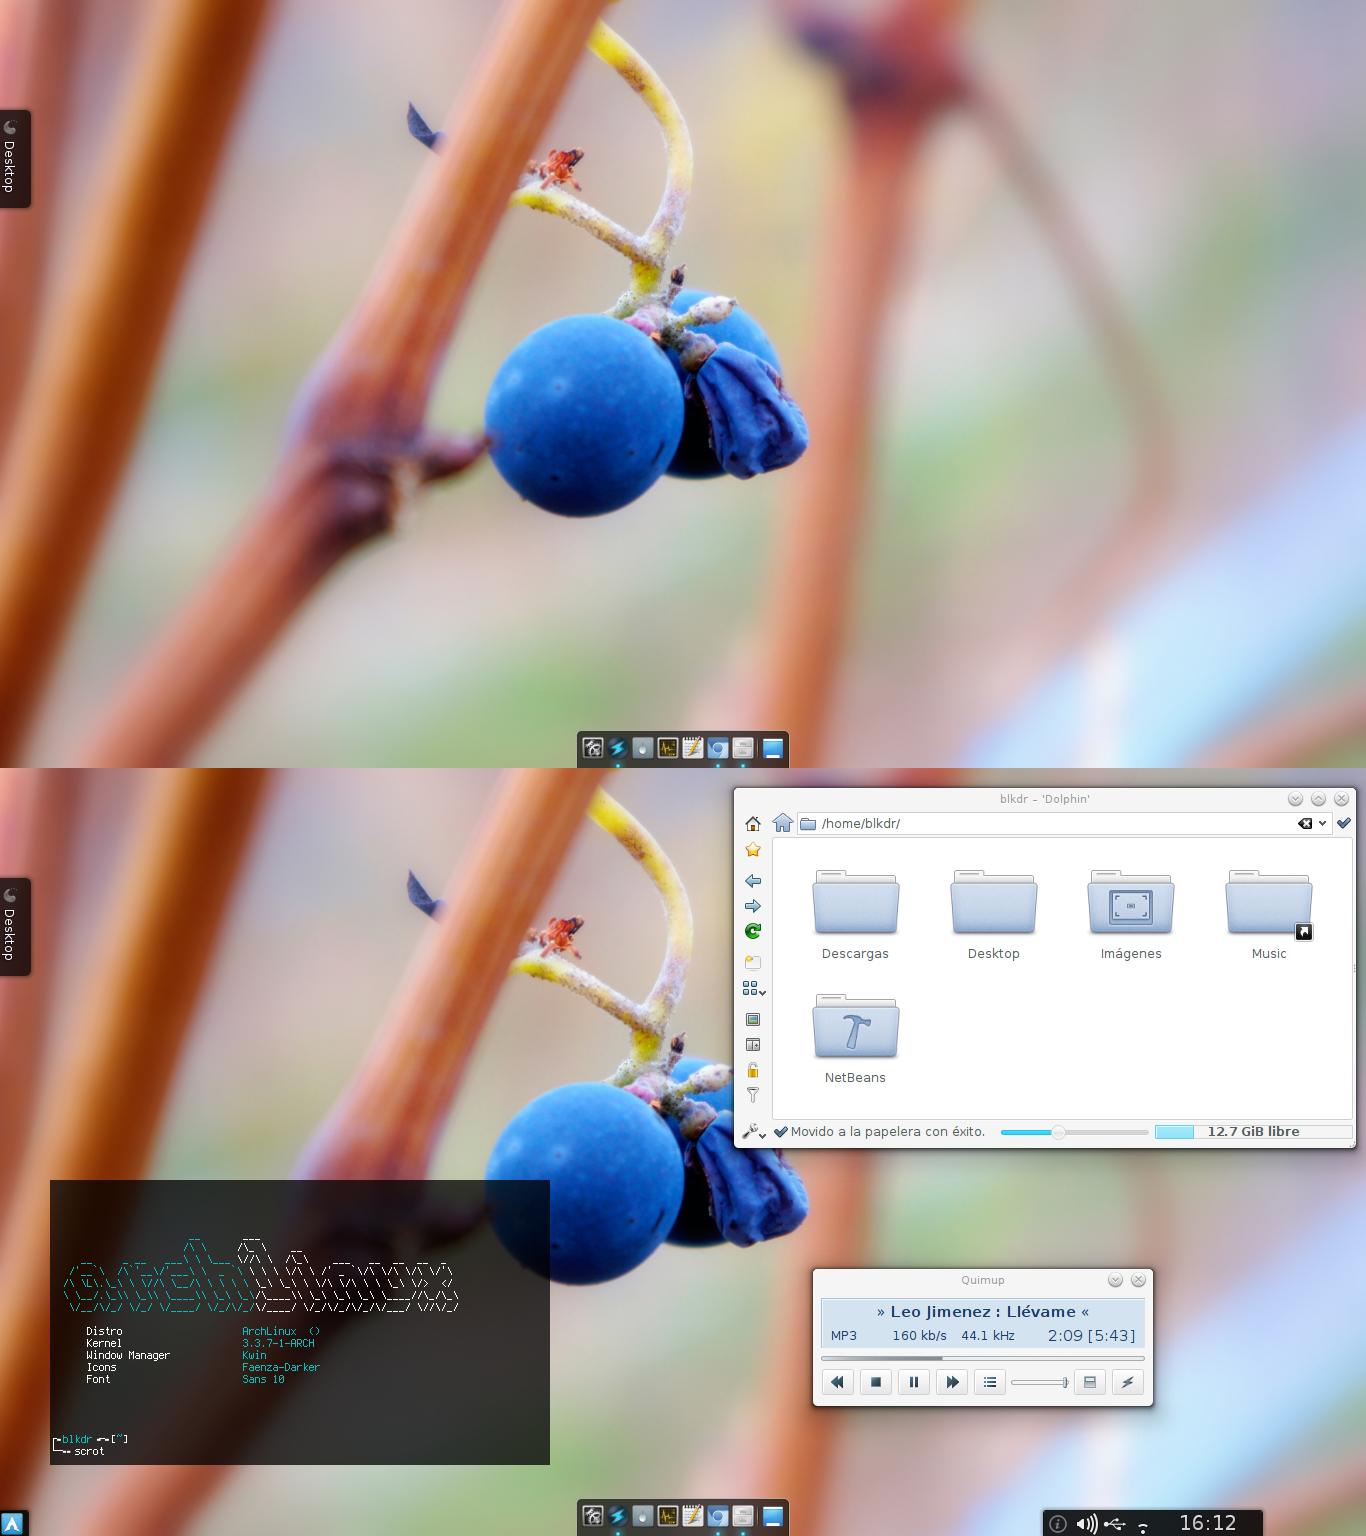 Friday Screenshot by blkdr